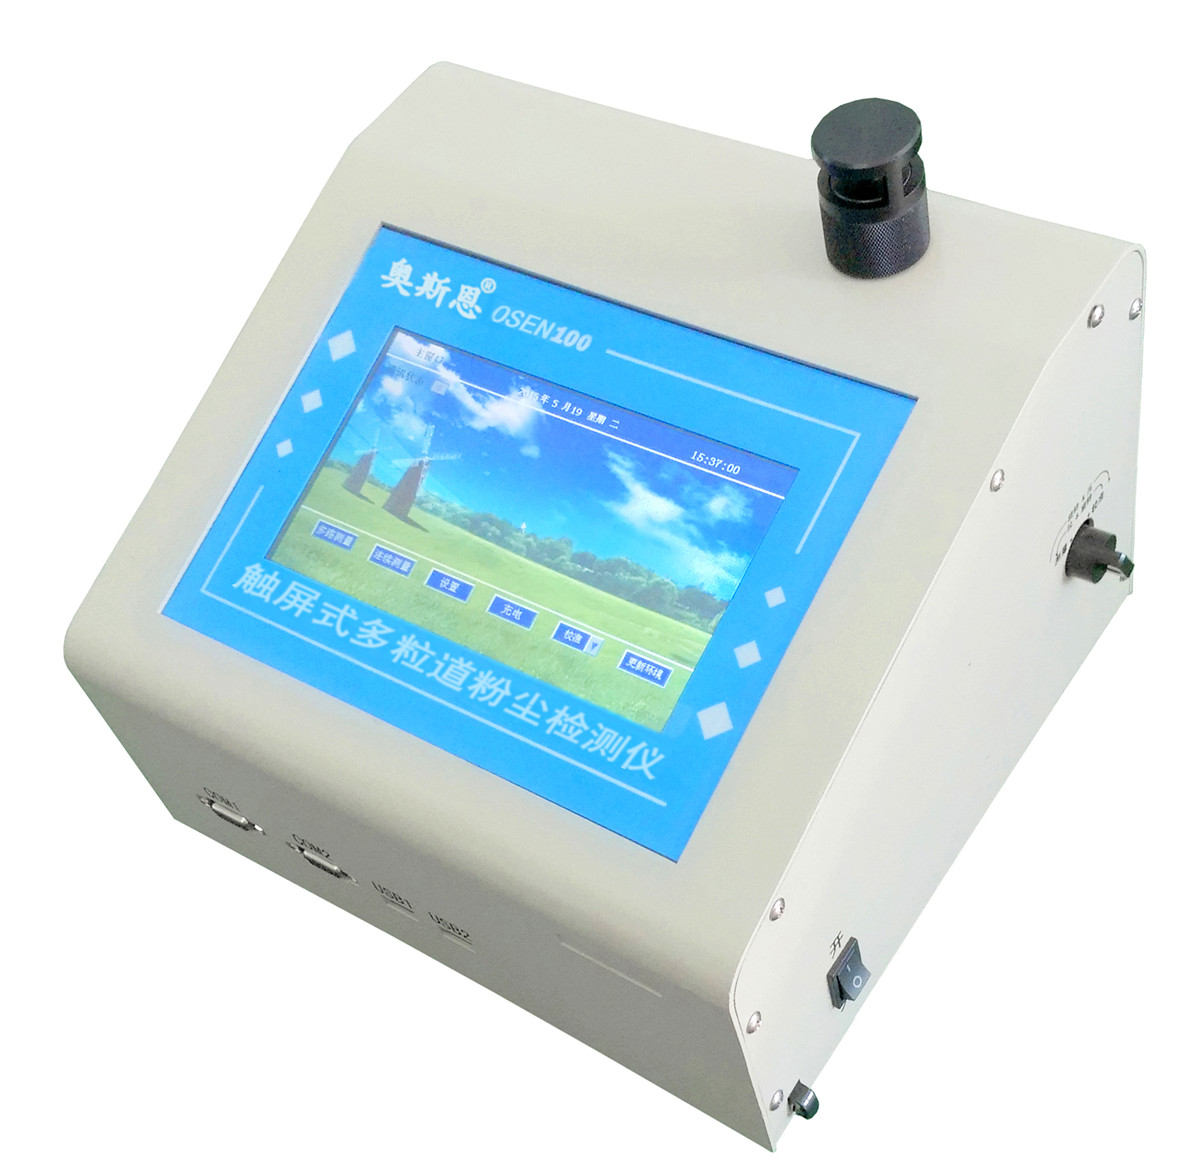 OSEN100全触屏式多通道粉尘测试仪 OSEN100多功能粉尘仪 奥斯恩品牌